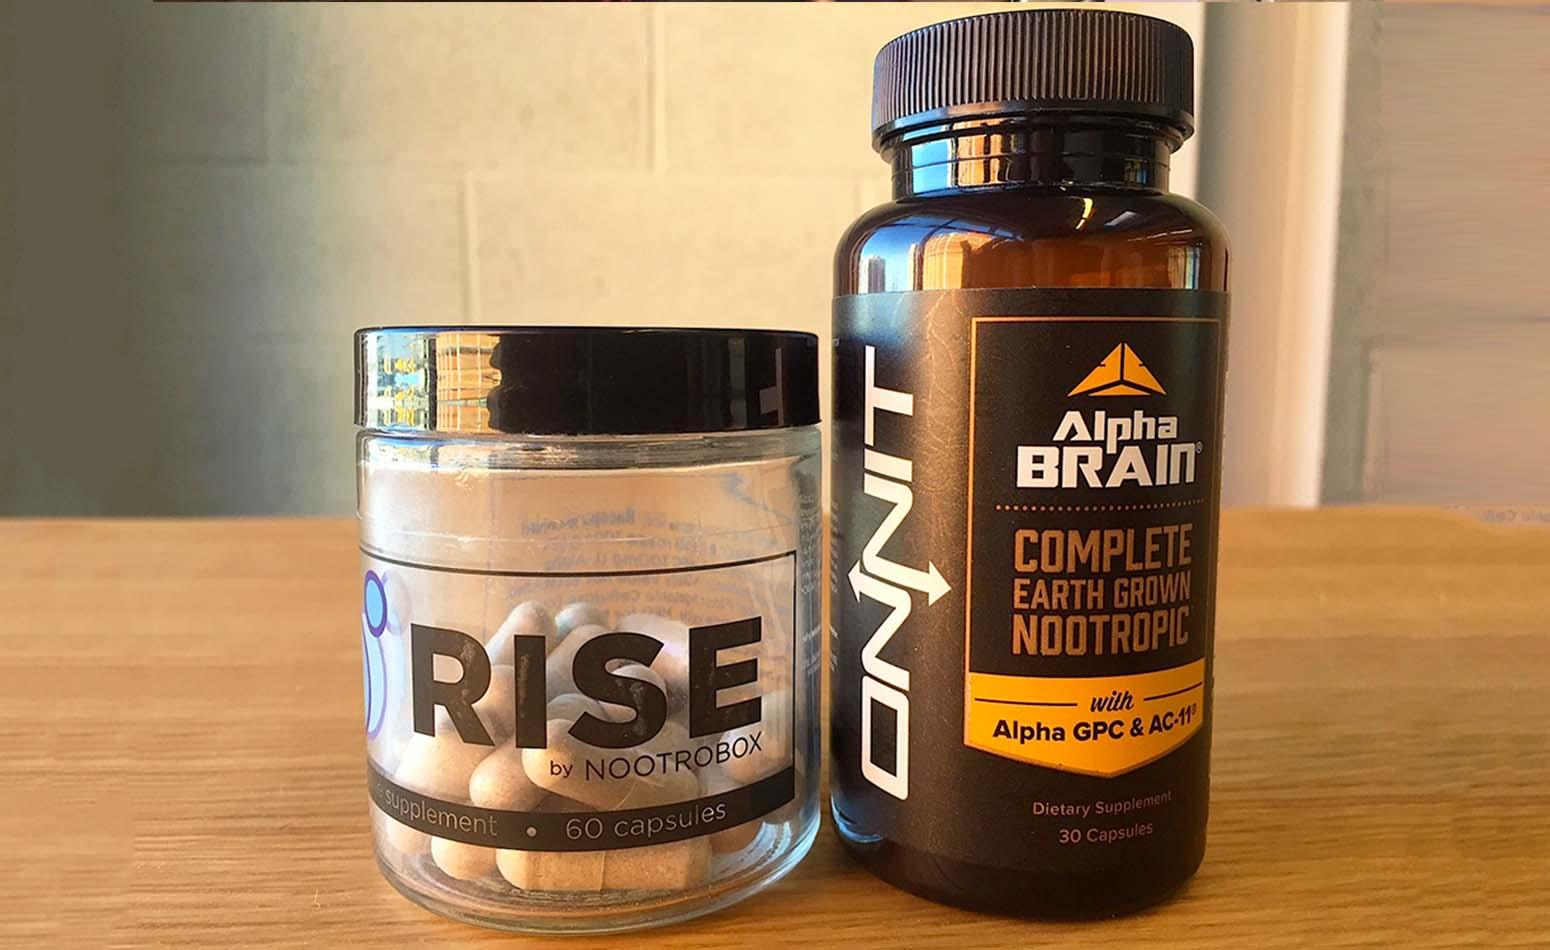 c7d9410e What's the Best Alpha BRAIN Alternative? | Brain Wiz